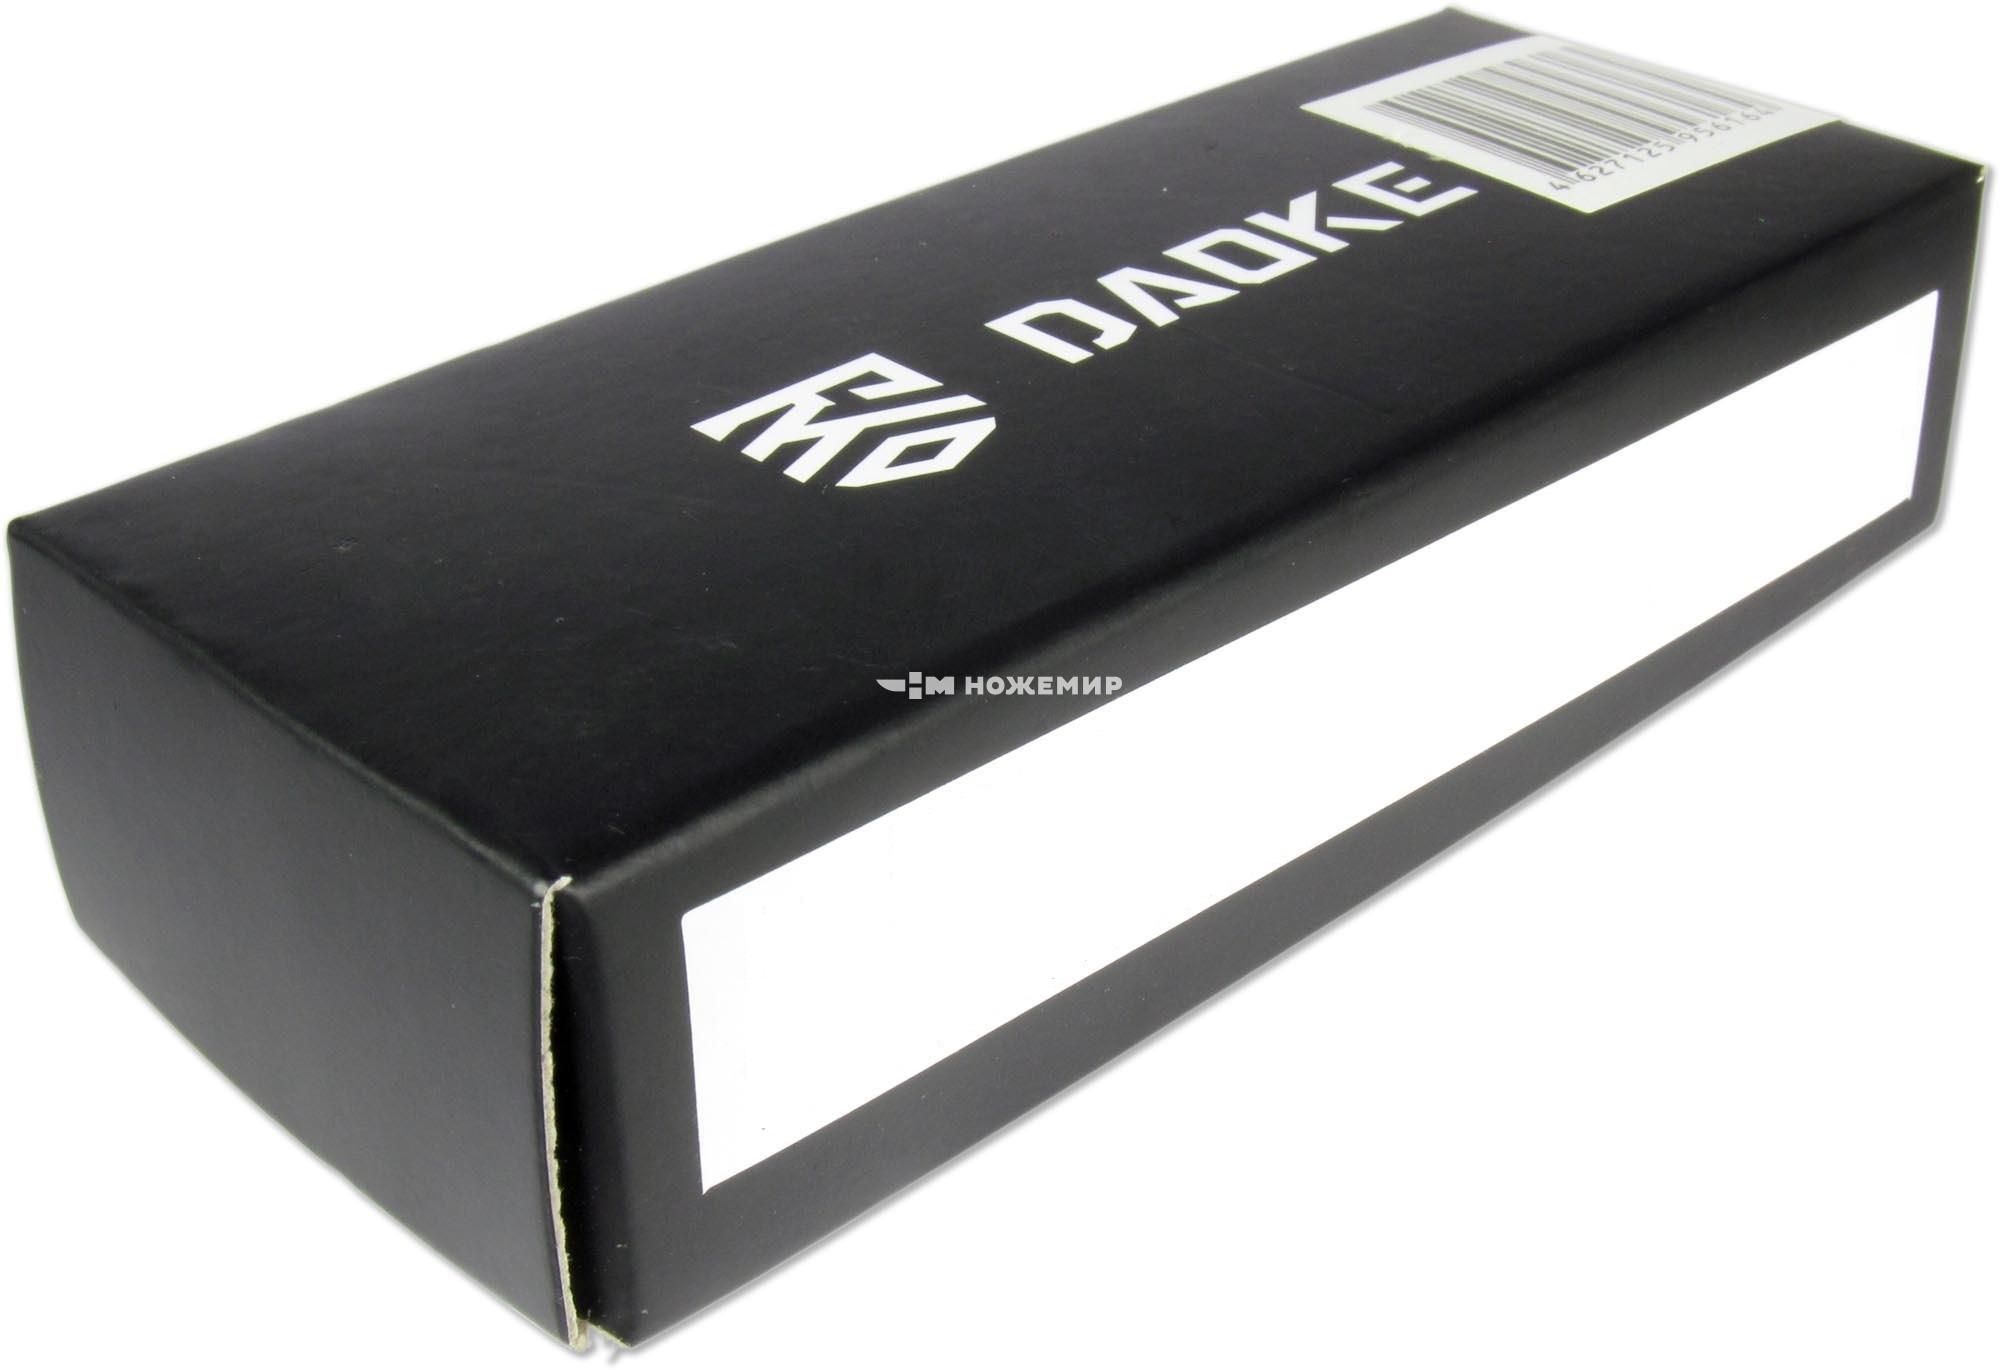 Фото 5 - Нож складной Daoke d622